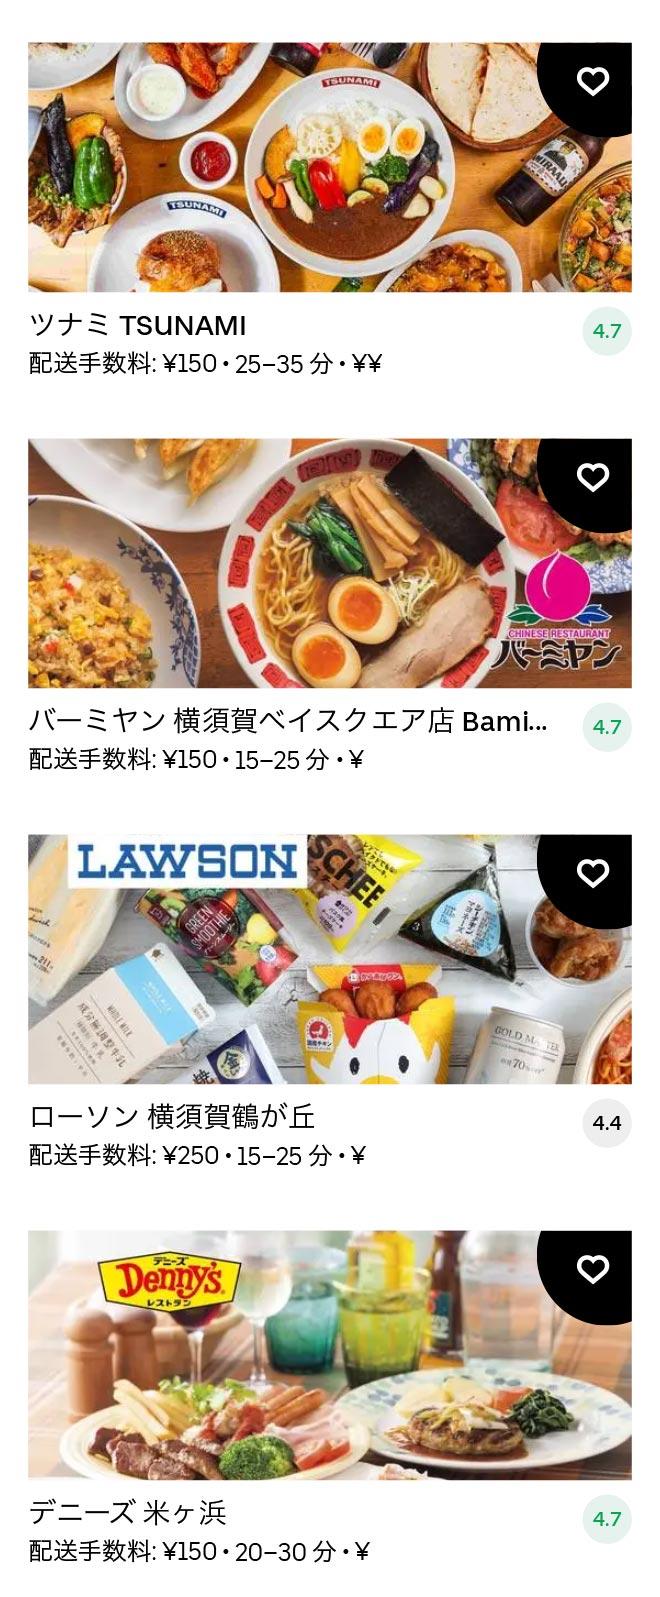 Yokosuka chuo menu 2011 03